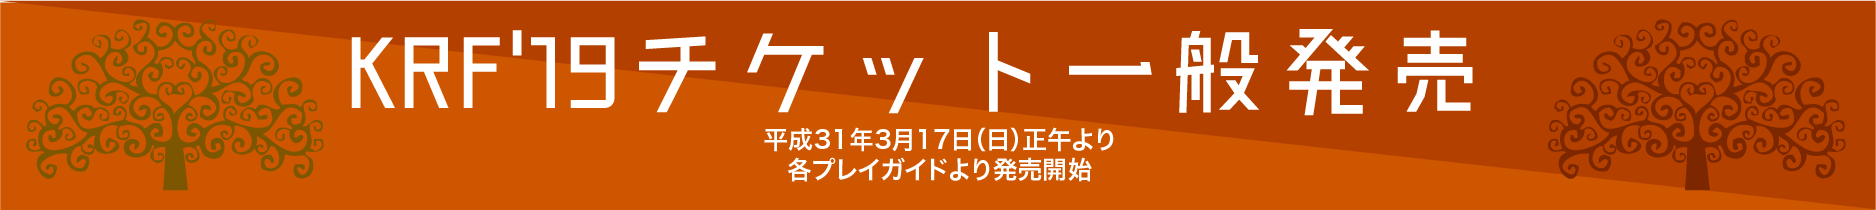 KRF'19 チケット一般発売